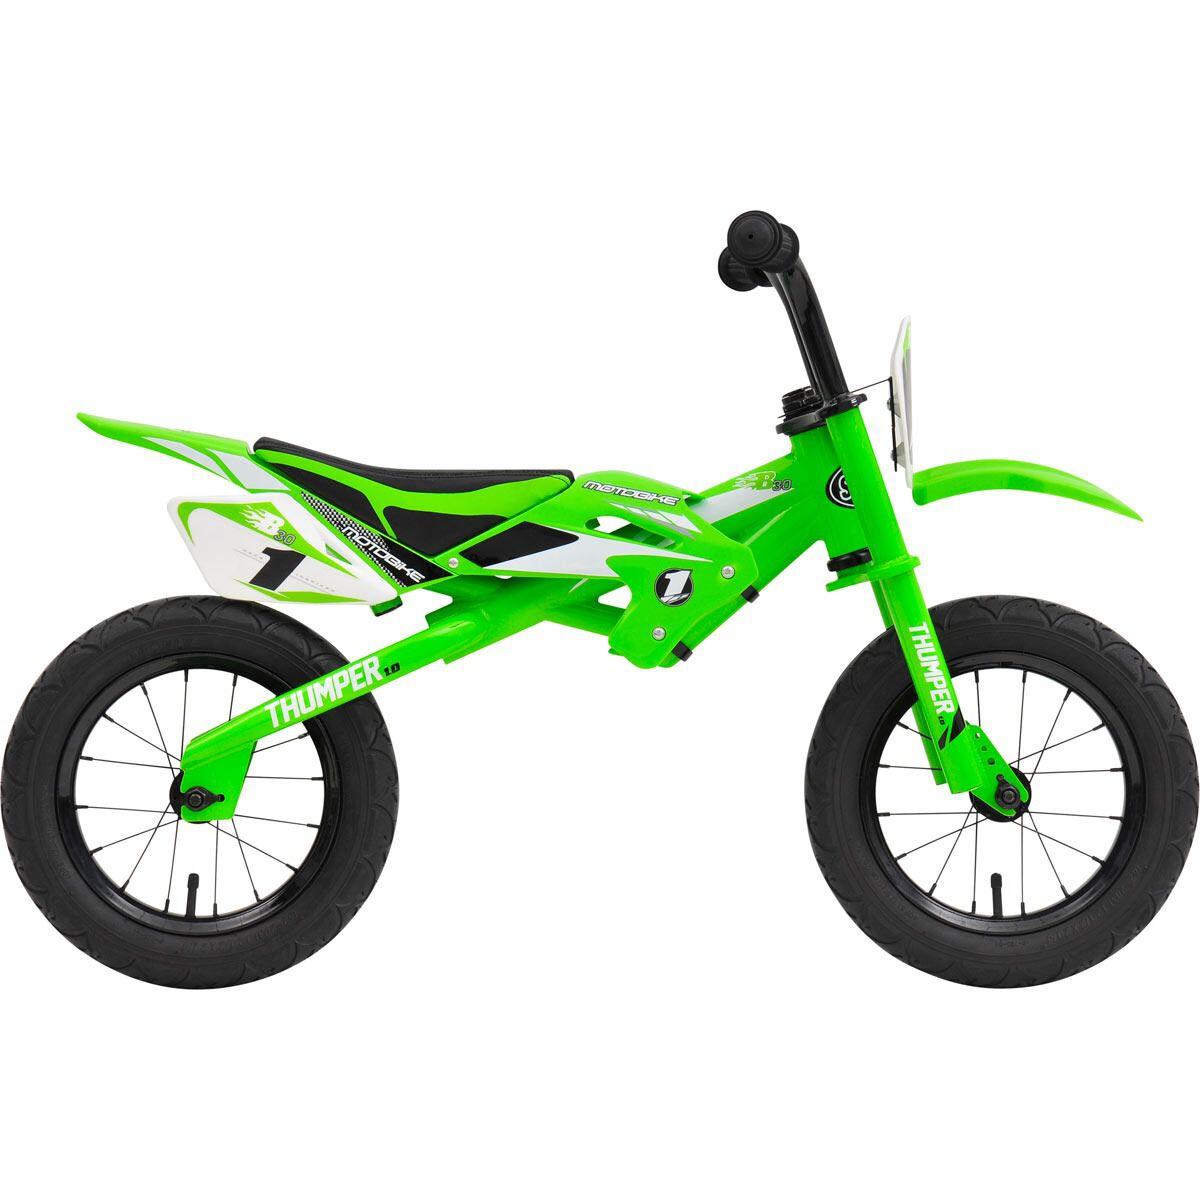 Water Pump Rebuild Kit For 1998 Suzuki RM80 Offroad Motorcycle~Winderosa 821504